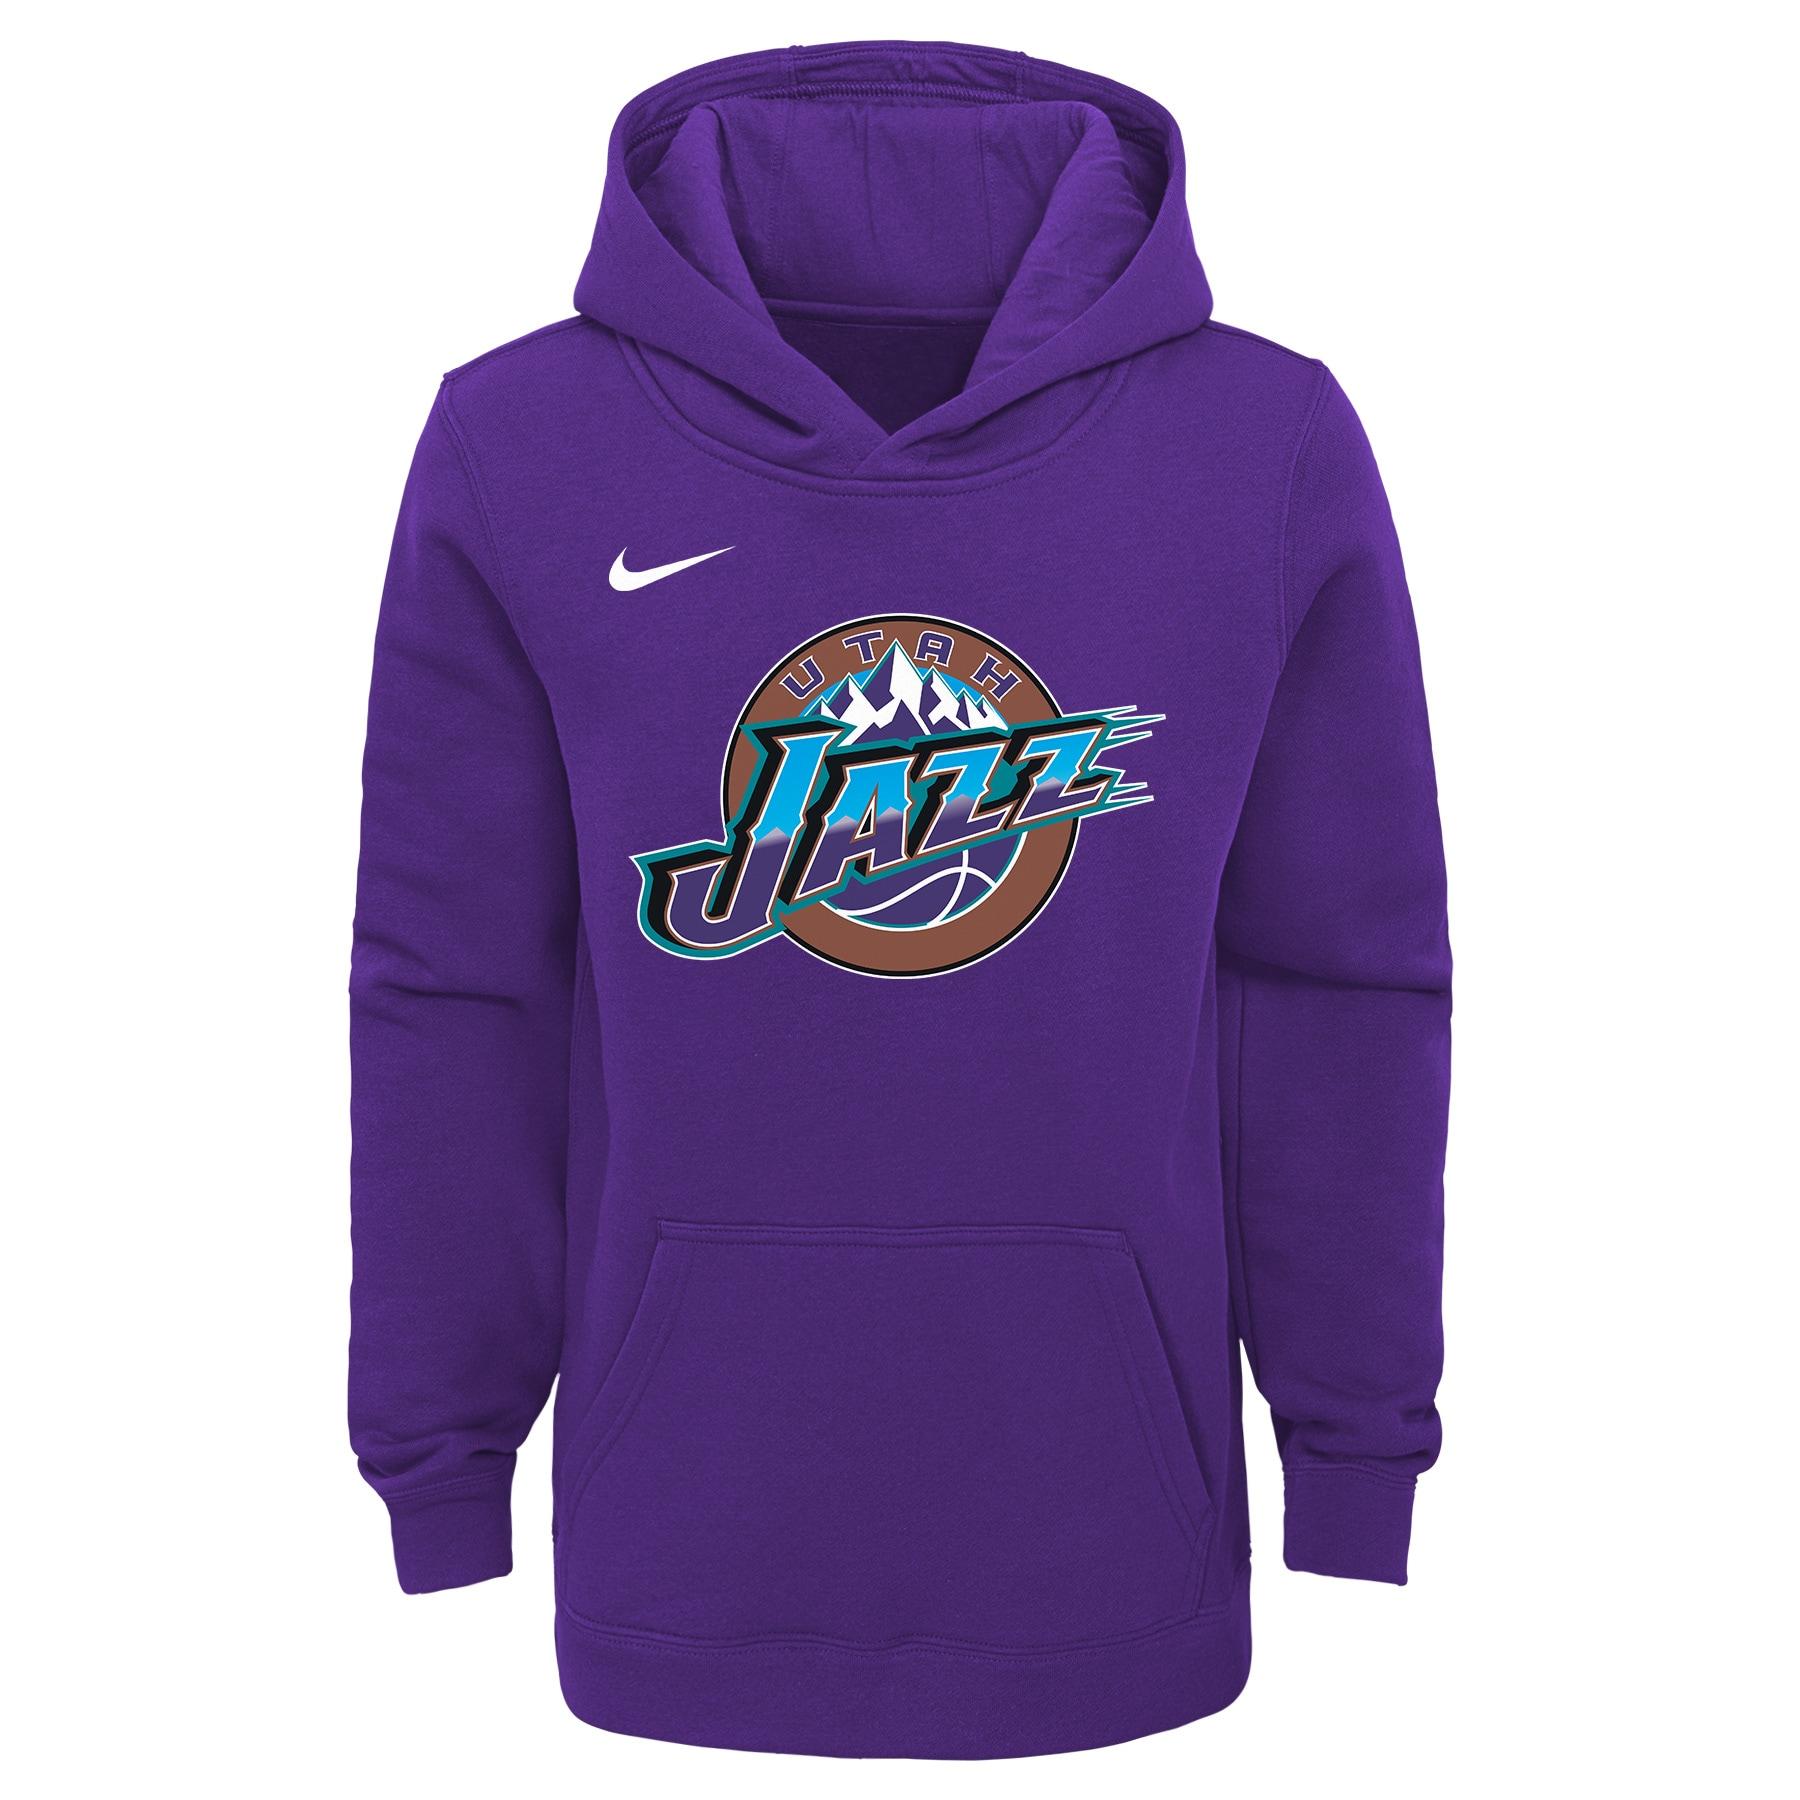 Utah Jazz Nike Youth Hardwood Classics Club Fleece Pullover Hoodie - Purple